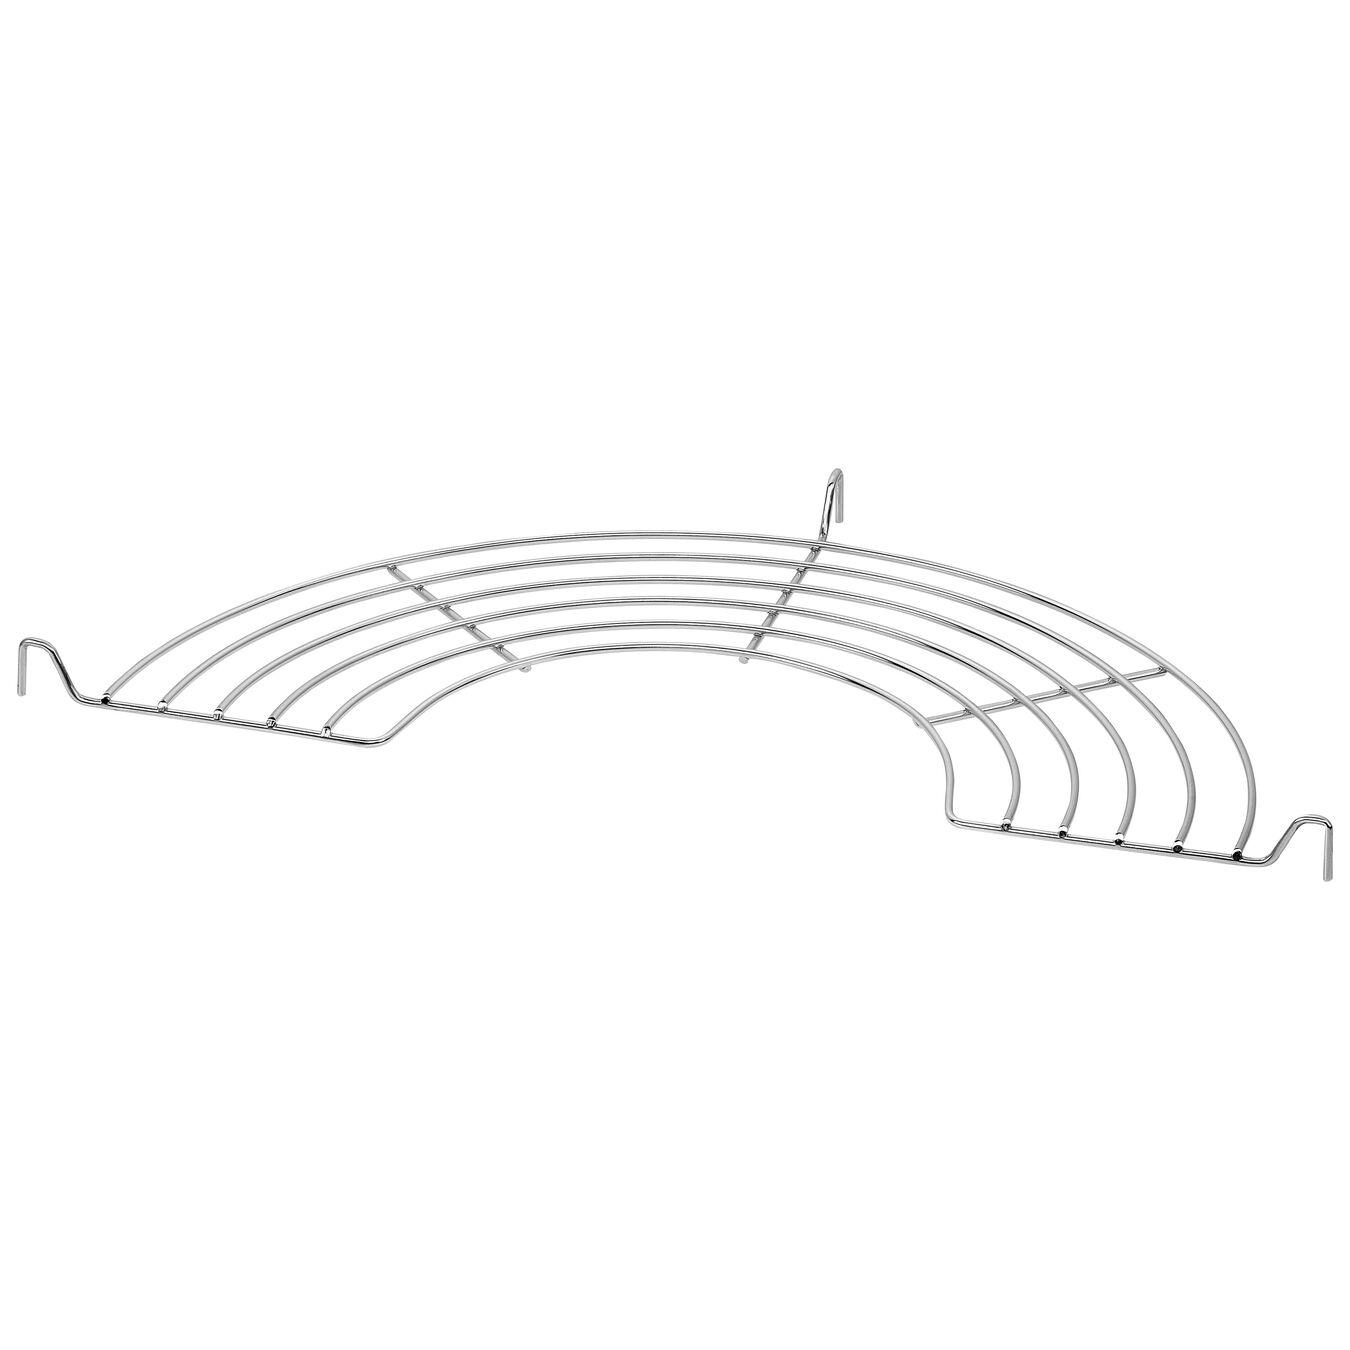 Wok 32 cm, Inox 18/10,,large 5